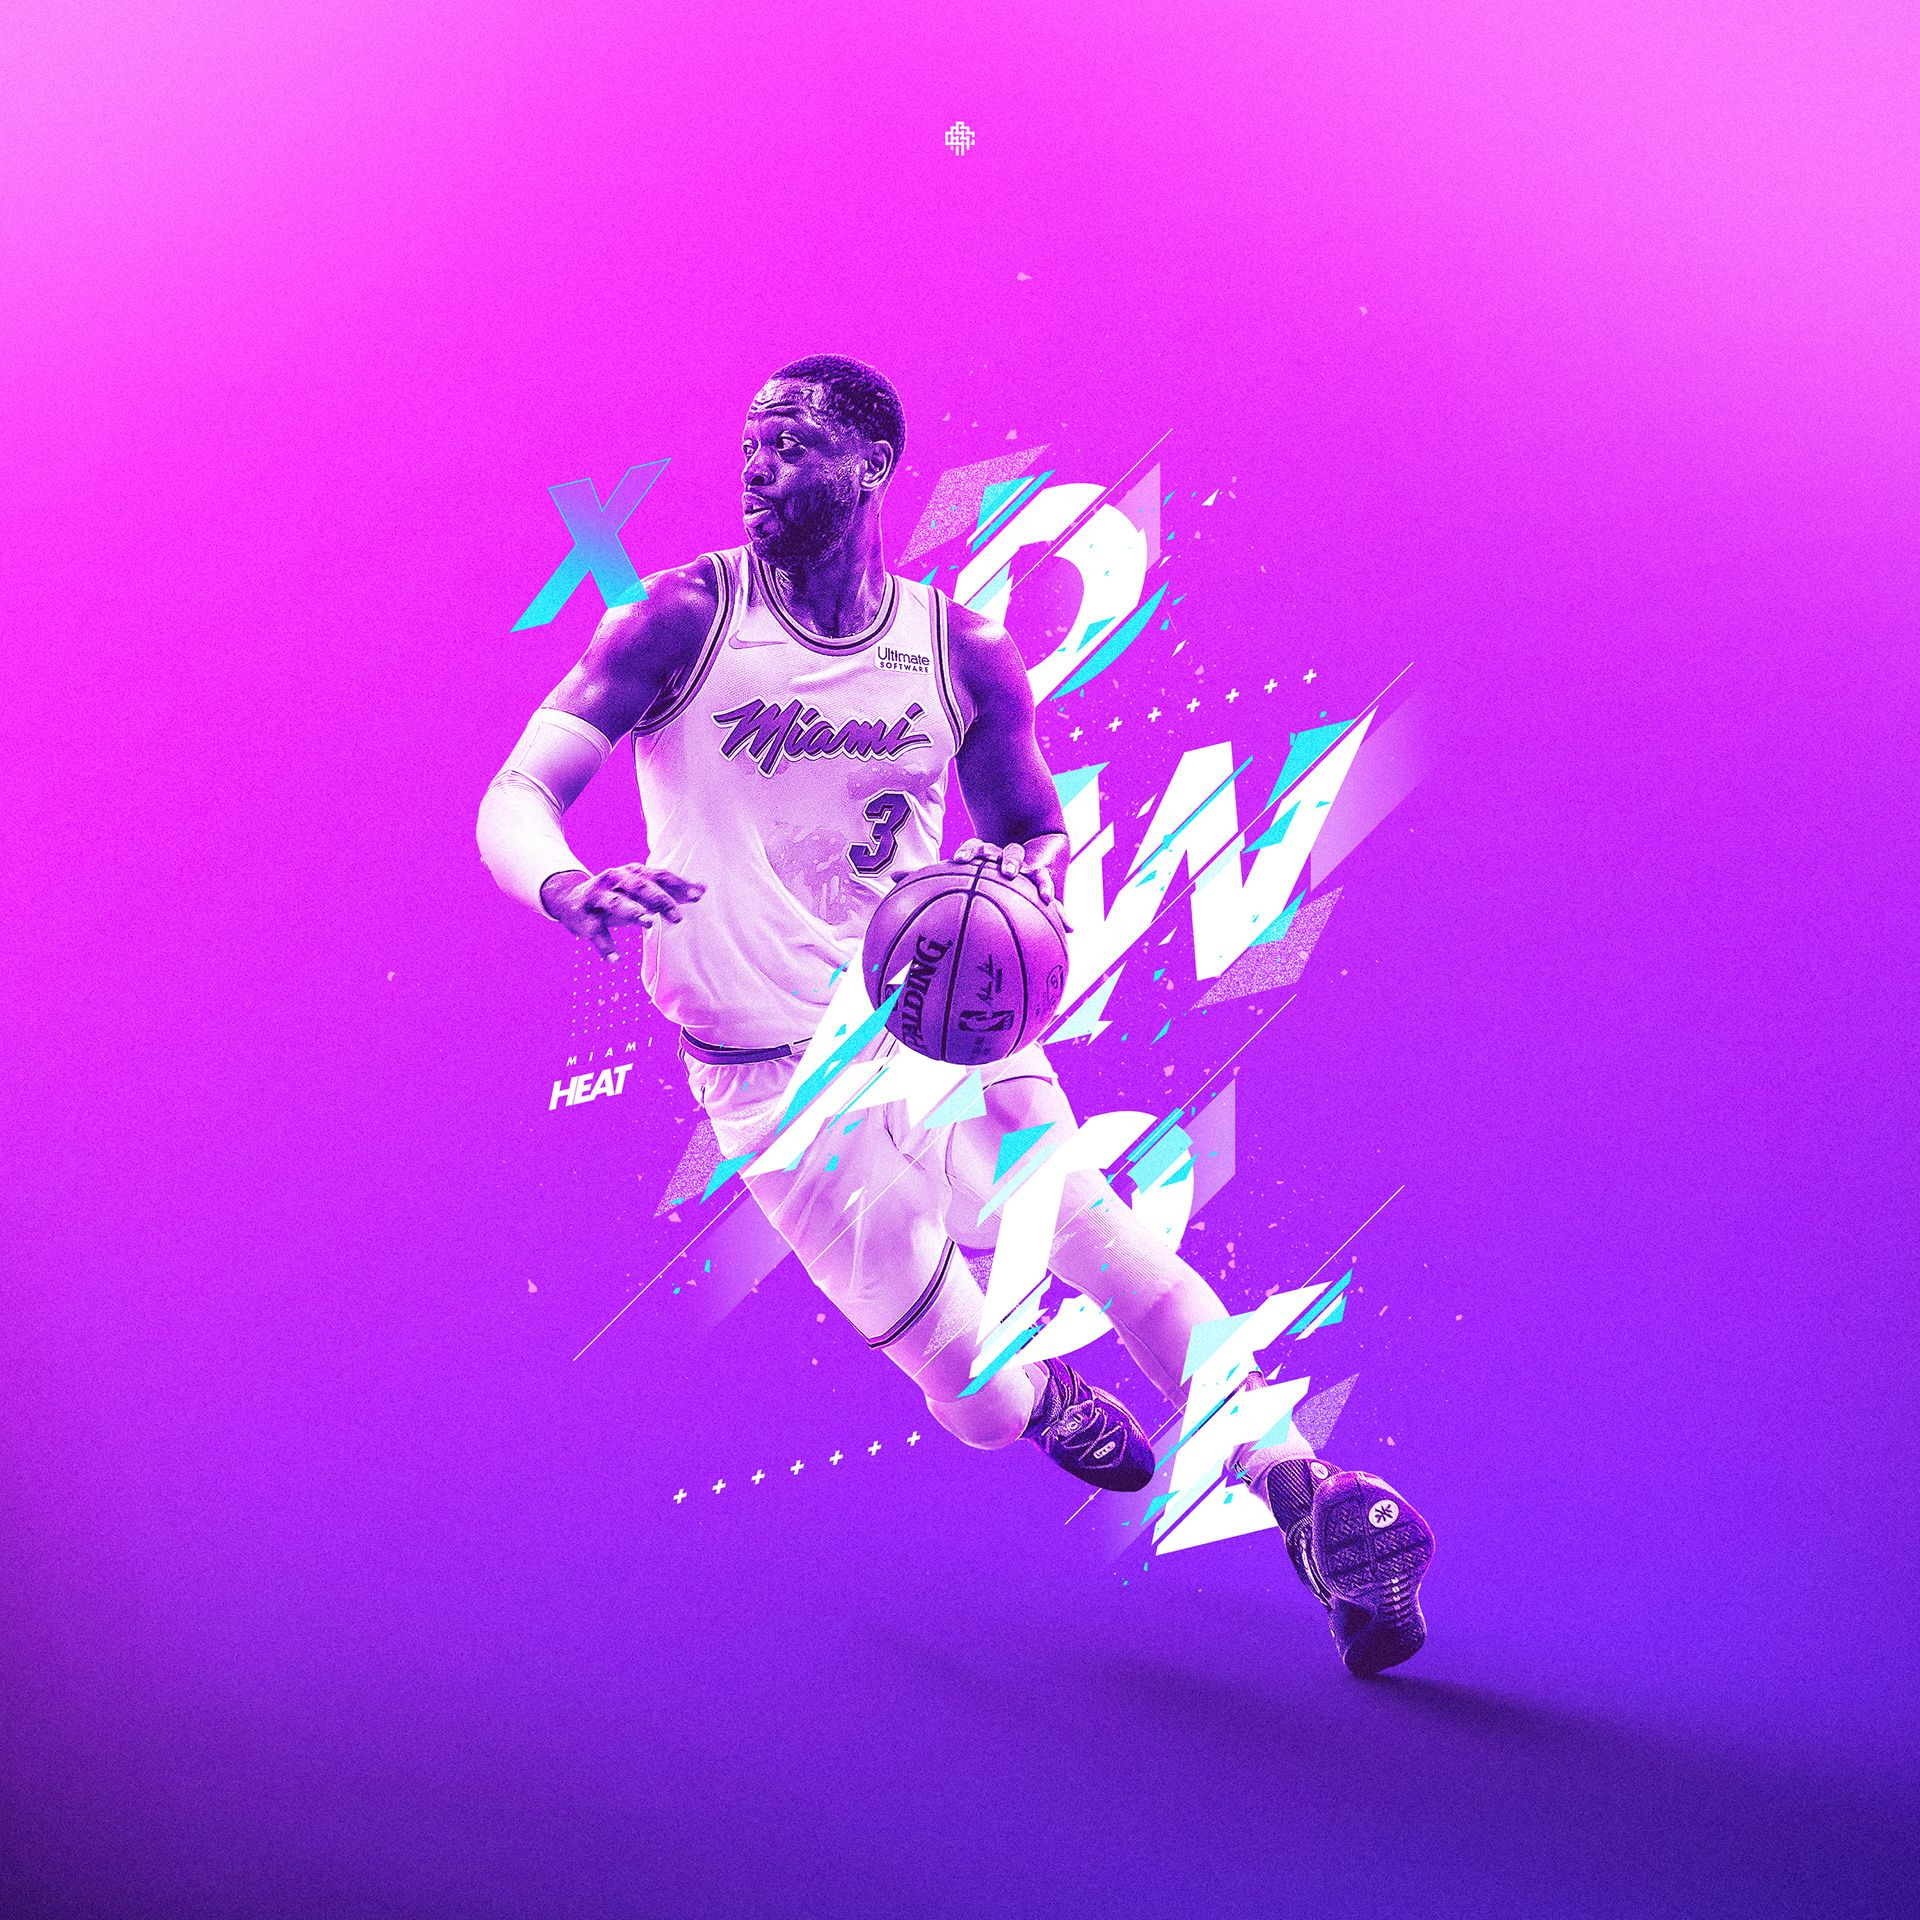 Dwyane Wade Retro On Behance Dwyane Wade Nba Wallpapers Nba Basketball Art